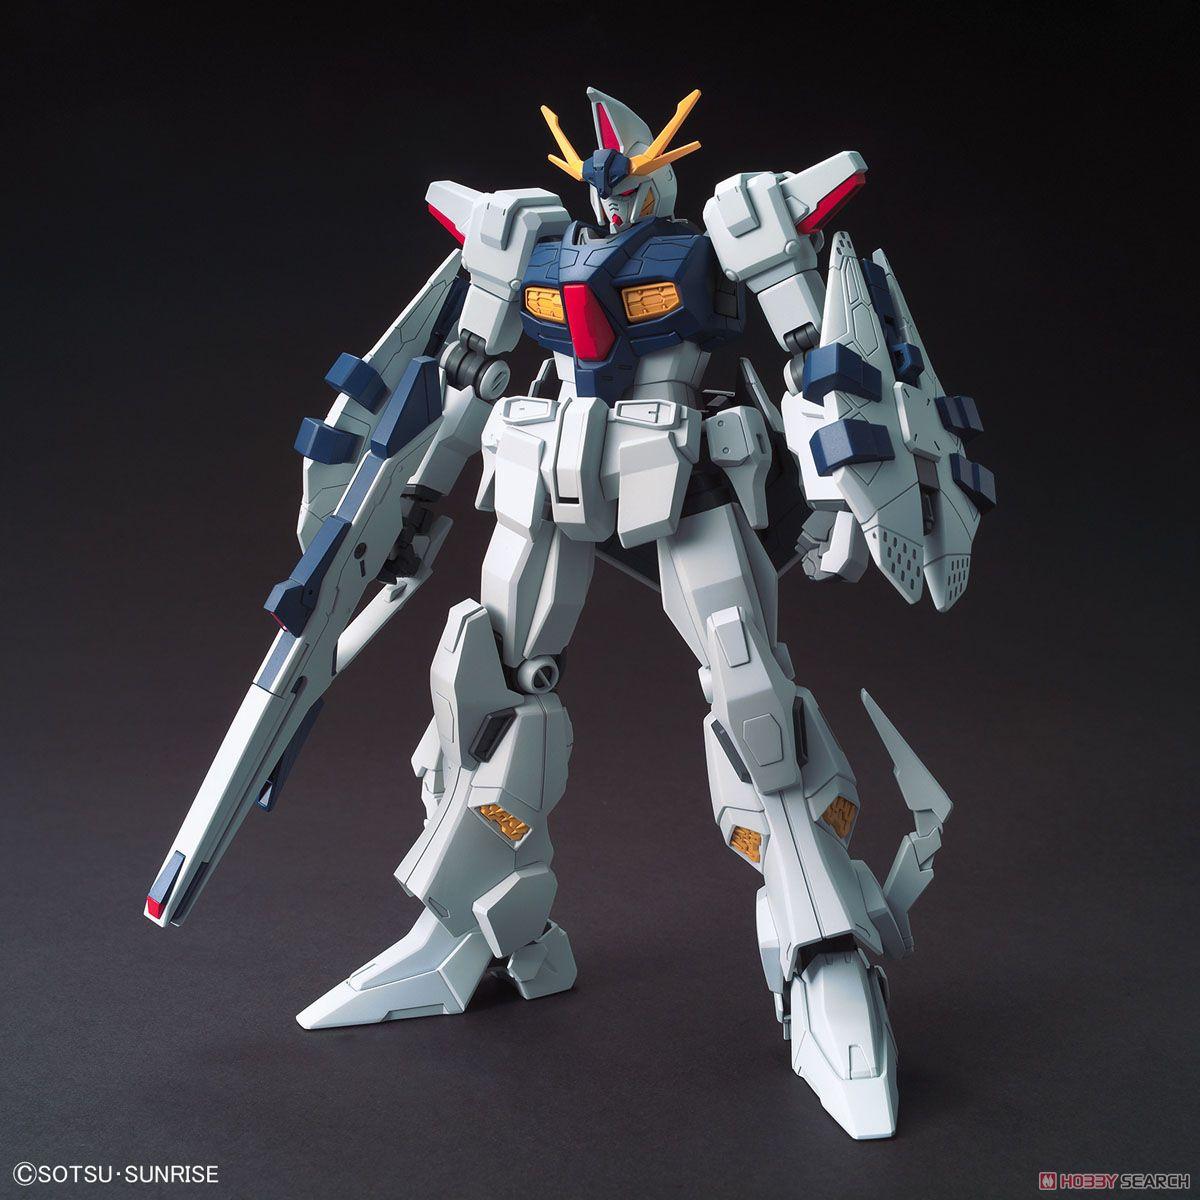 HGUC 1/144『ペーネロペー』機動戦士ガンダム 閃光のハサウェイ プラモデル-011